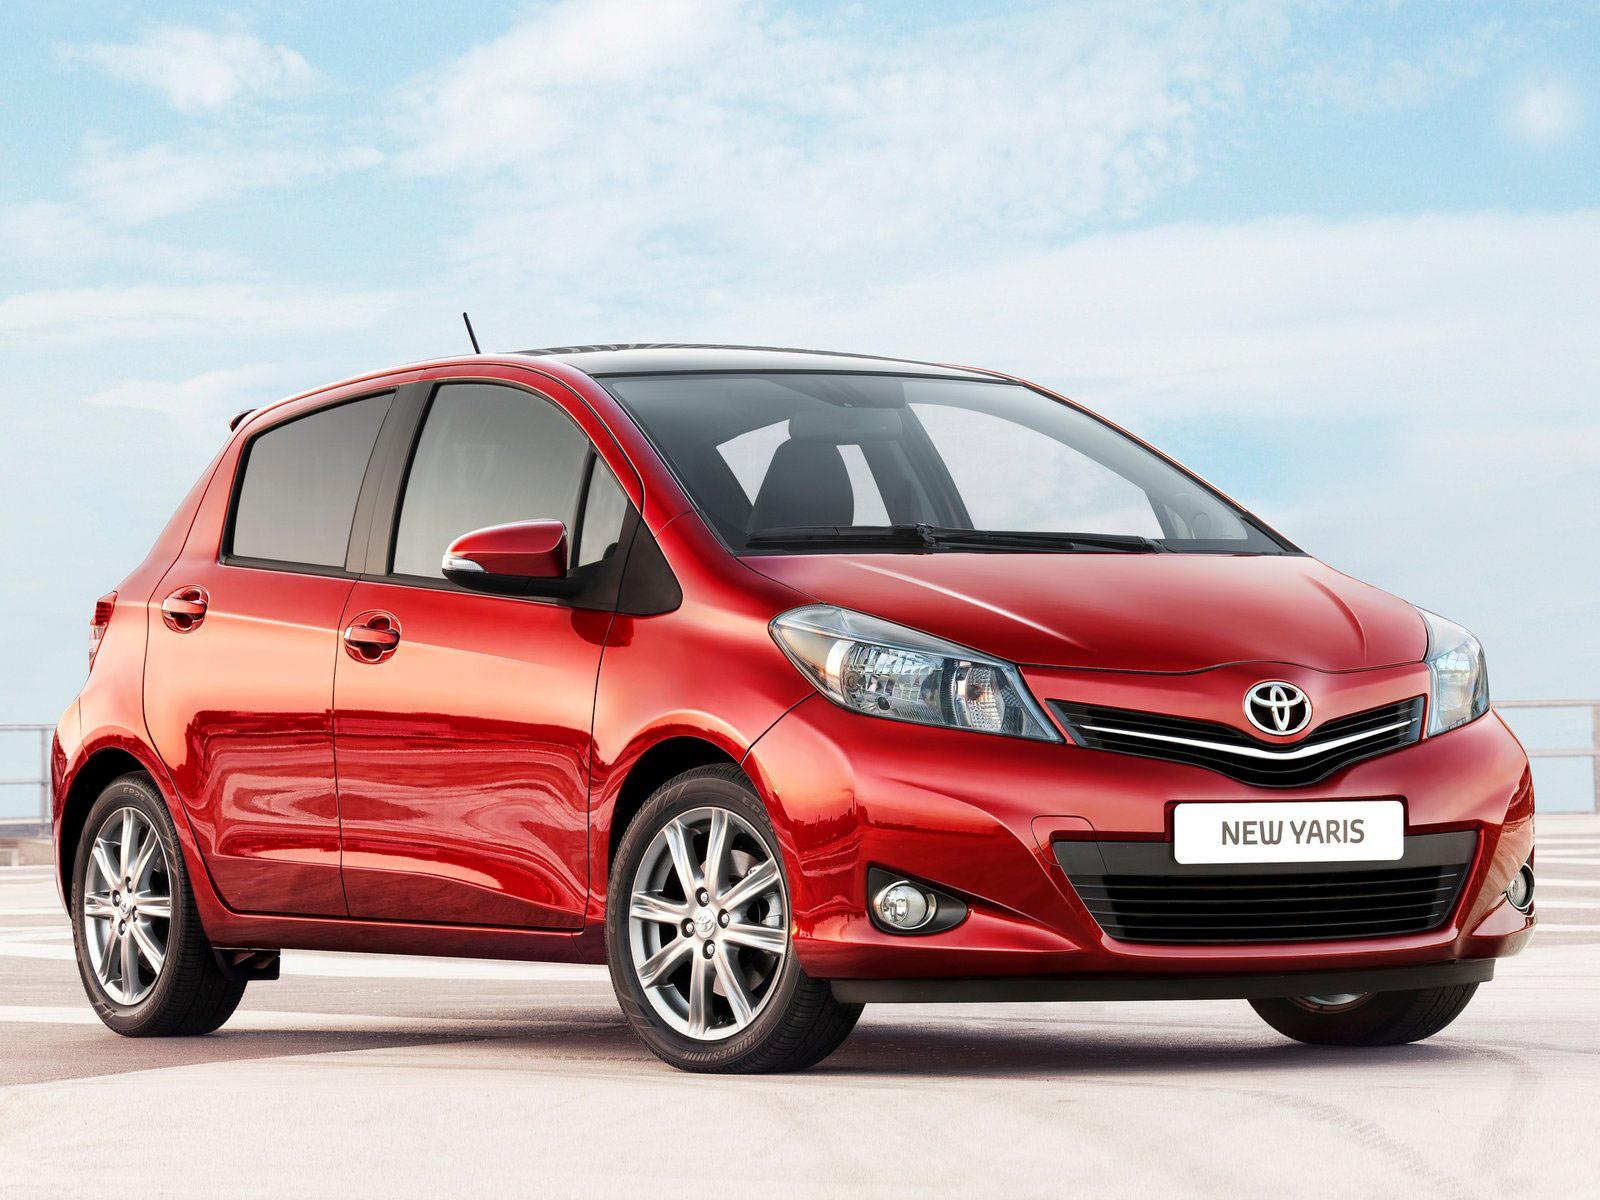 Kelebihan Kekurangan Mobil Toyota Yaris Tangguh